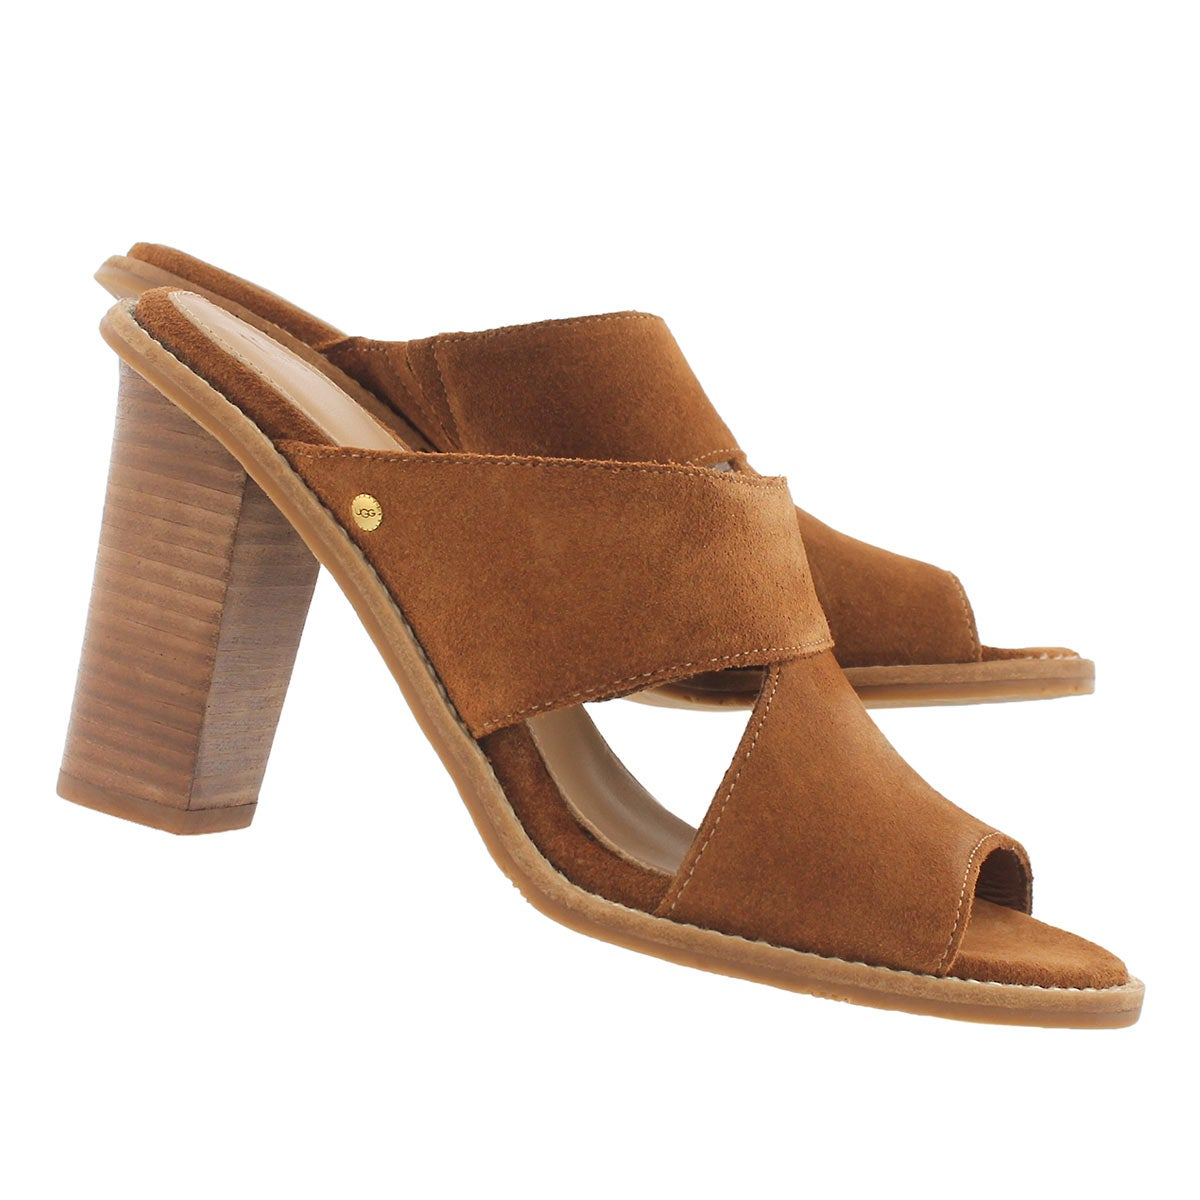 Lds Celia chestnut slide dress sandal